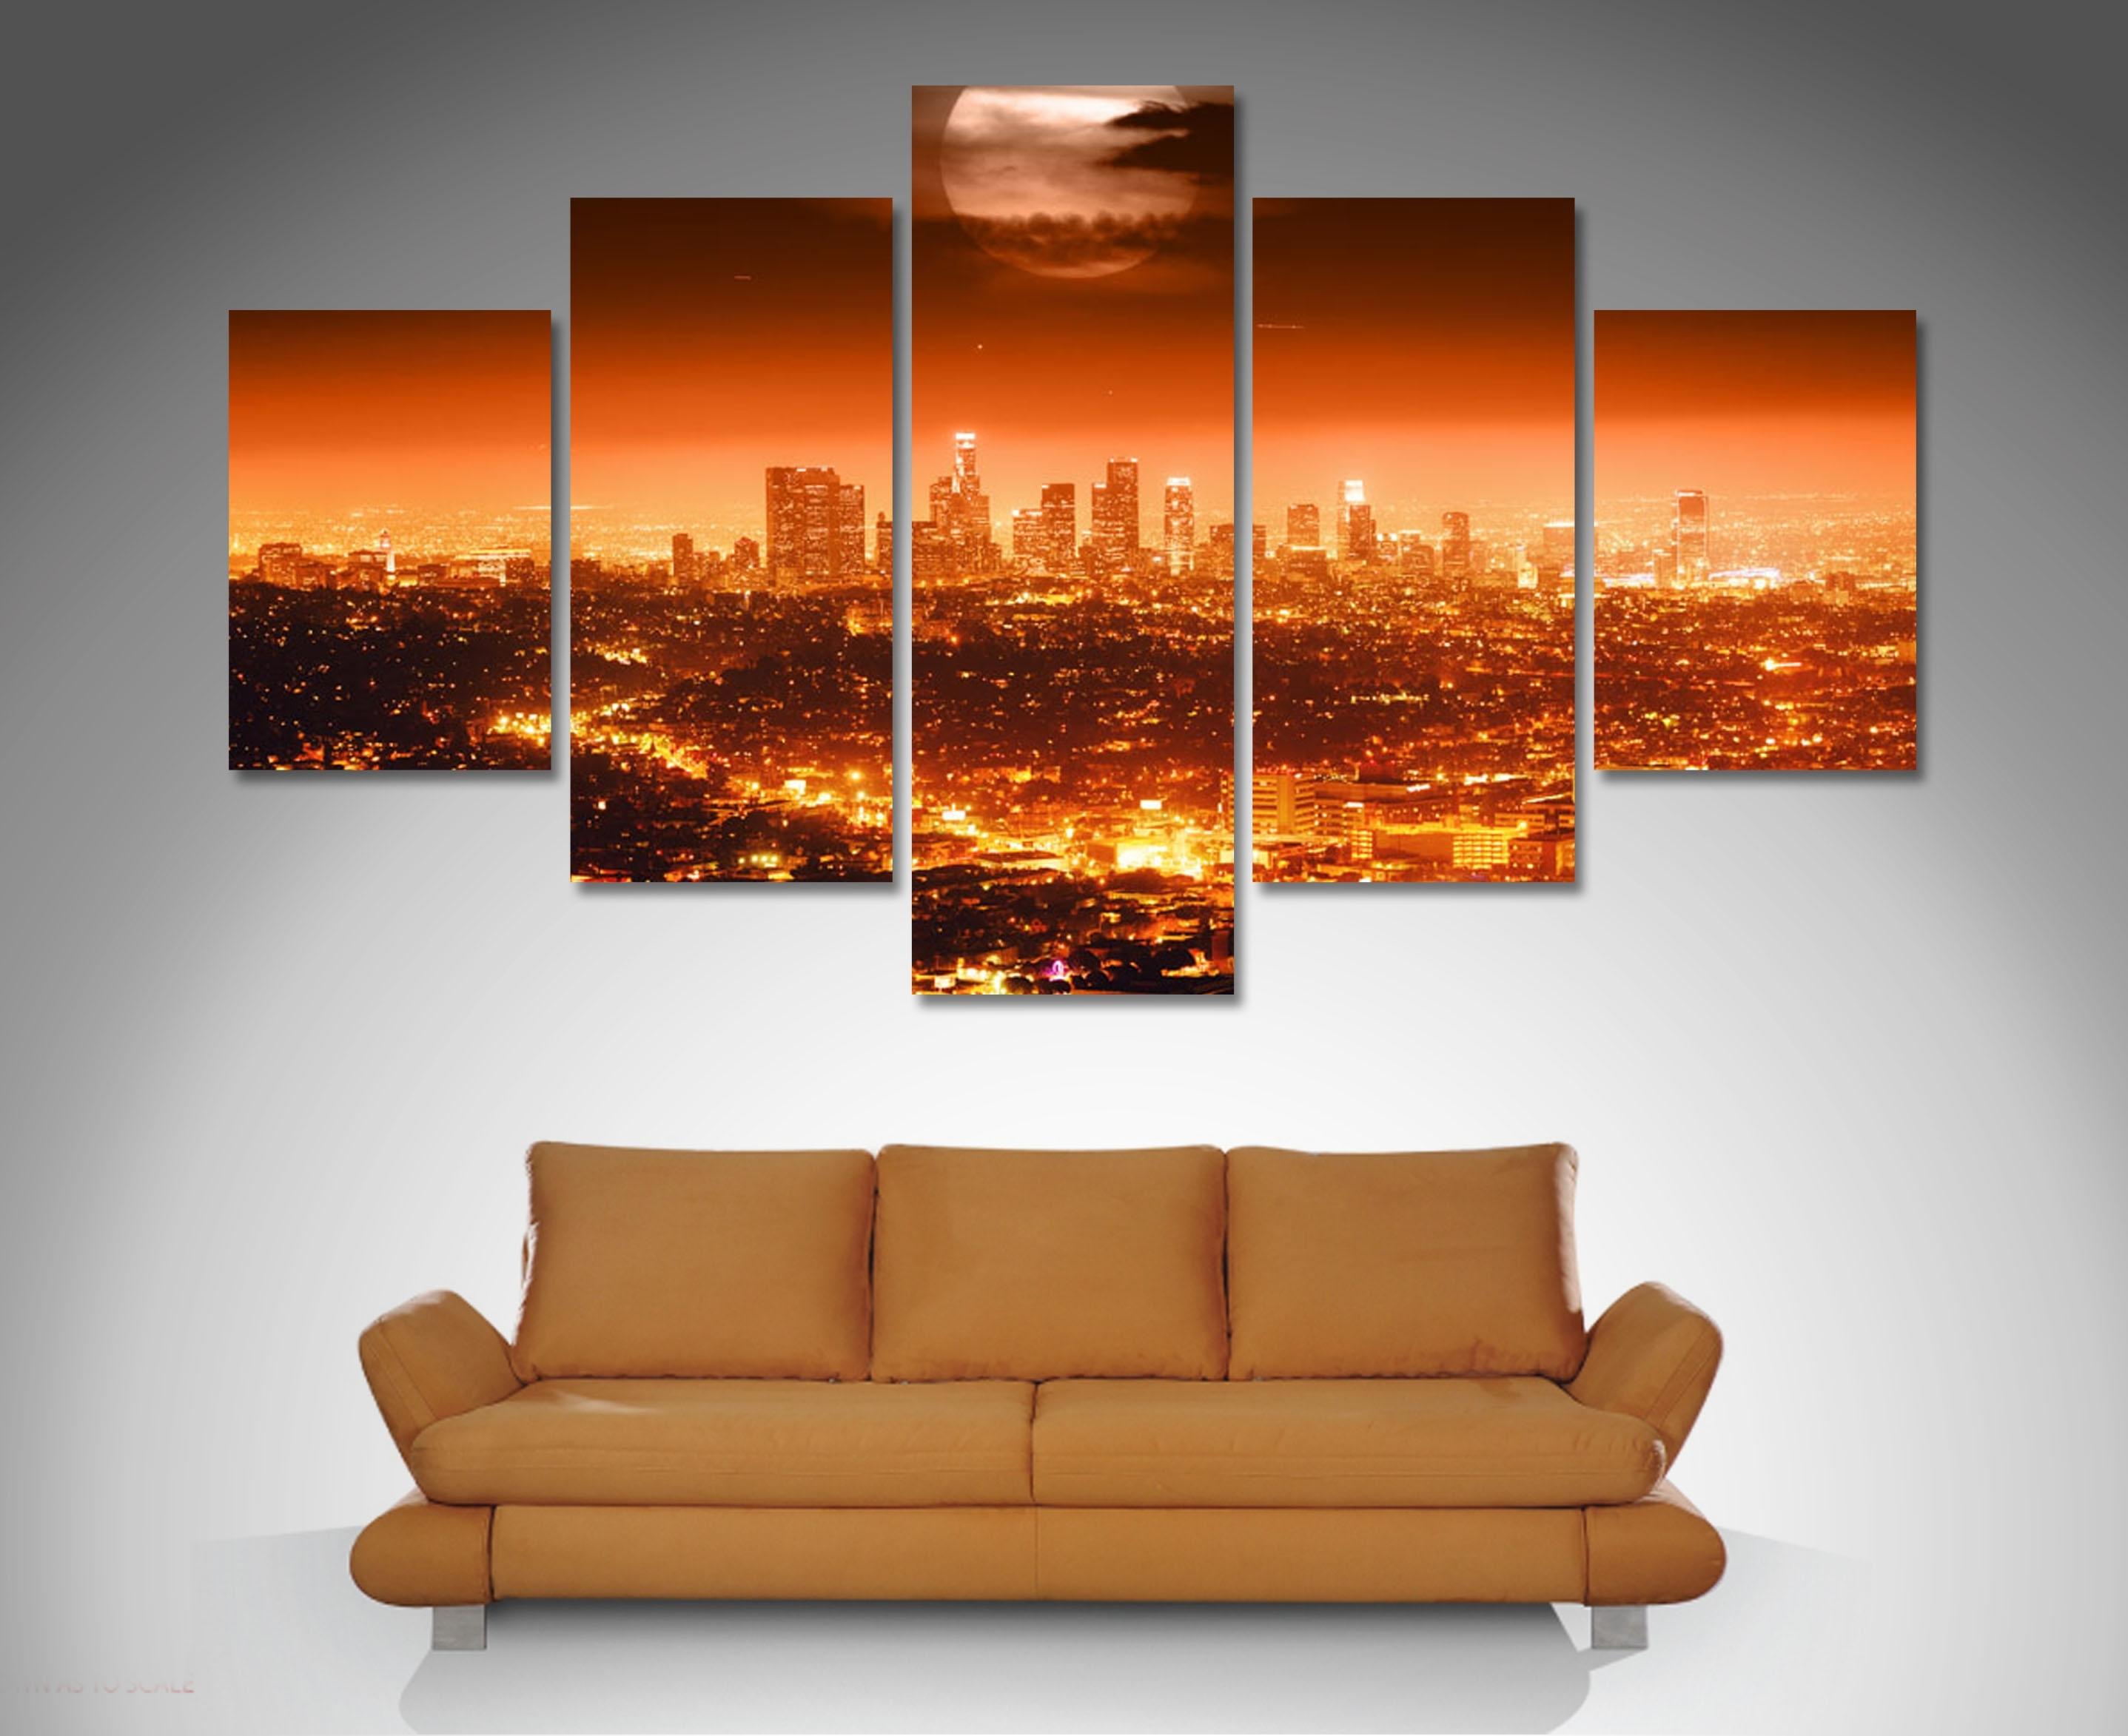 Los Angeles 5 Panel Diamond Shape Canvas Prints Http://www in 2017 Los Angeles Canvas Wall Art